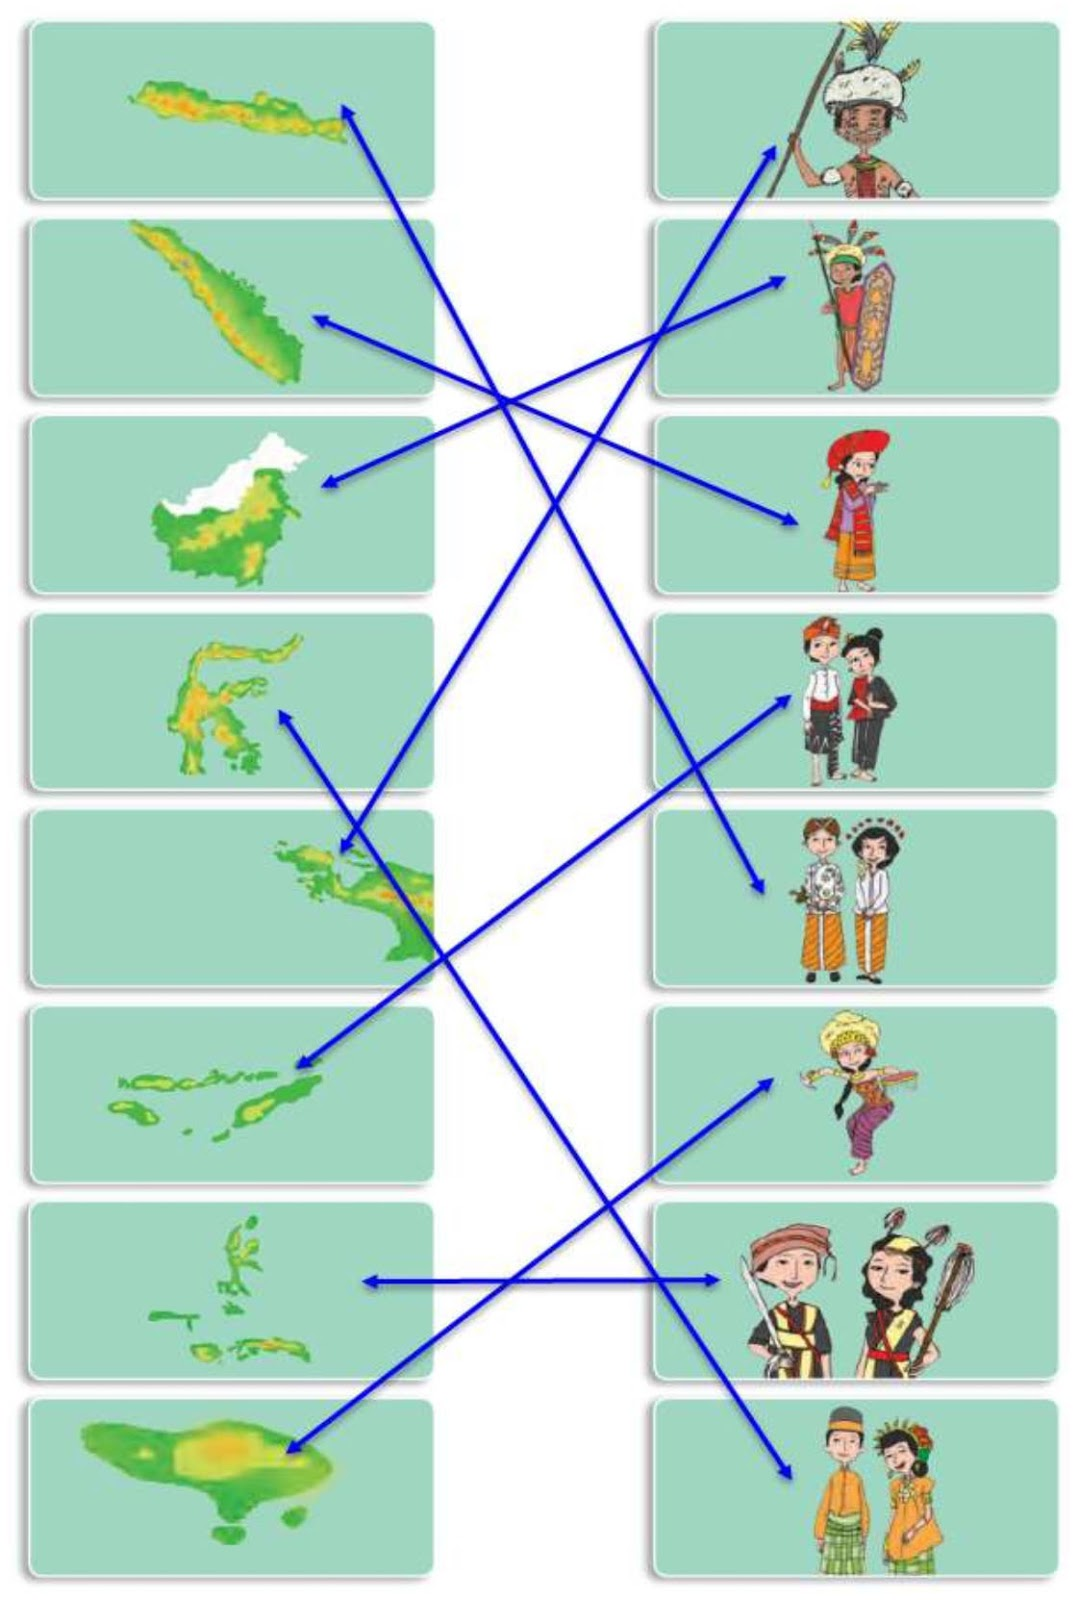 Subtema 2 Manusia Dan Lingkungan : subtema, manusia, lingkungan, Kunci, Jawaban, Siswa, Kelas, Halaman, Sanjayaops